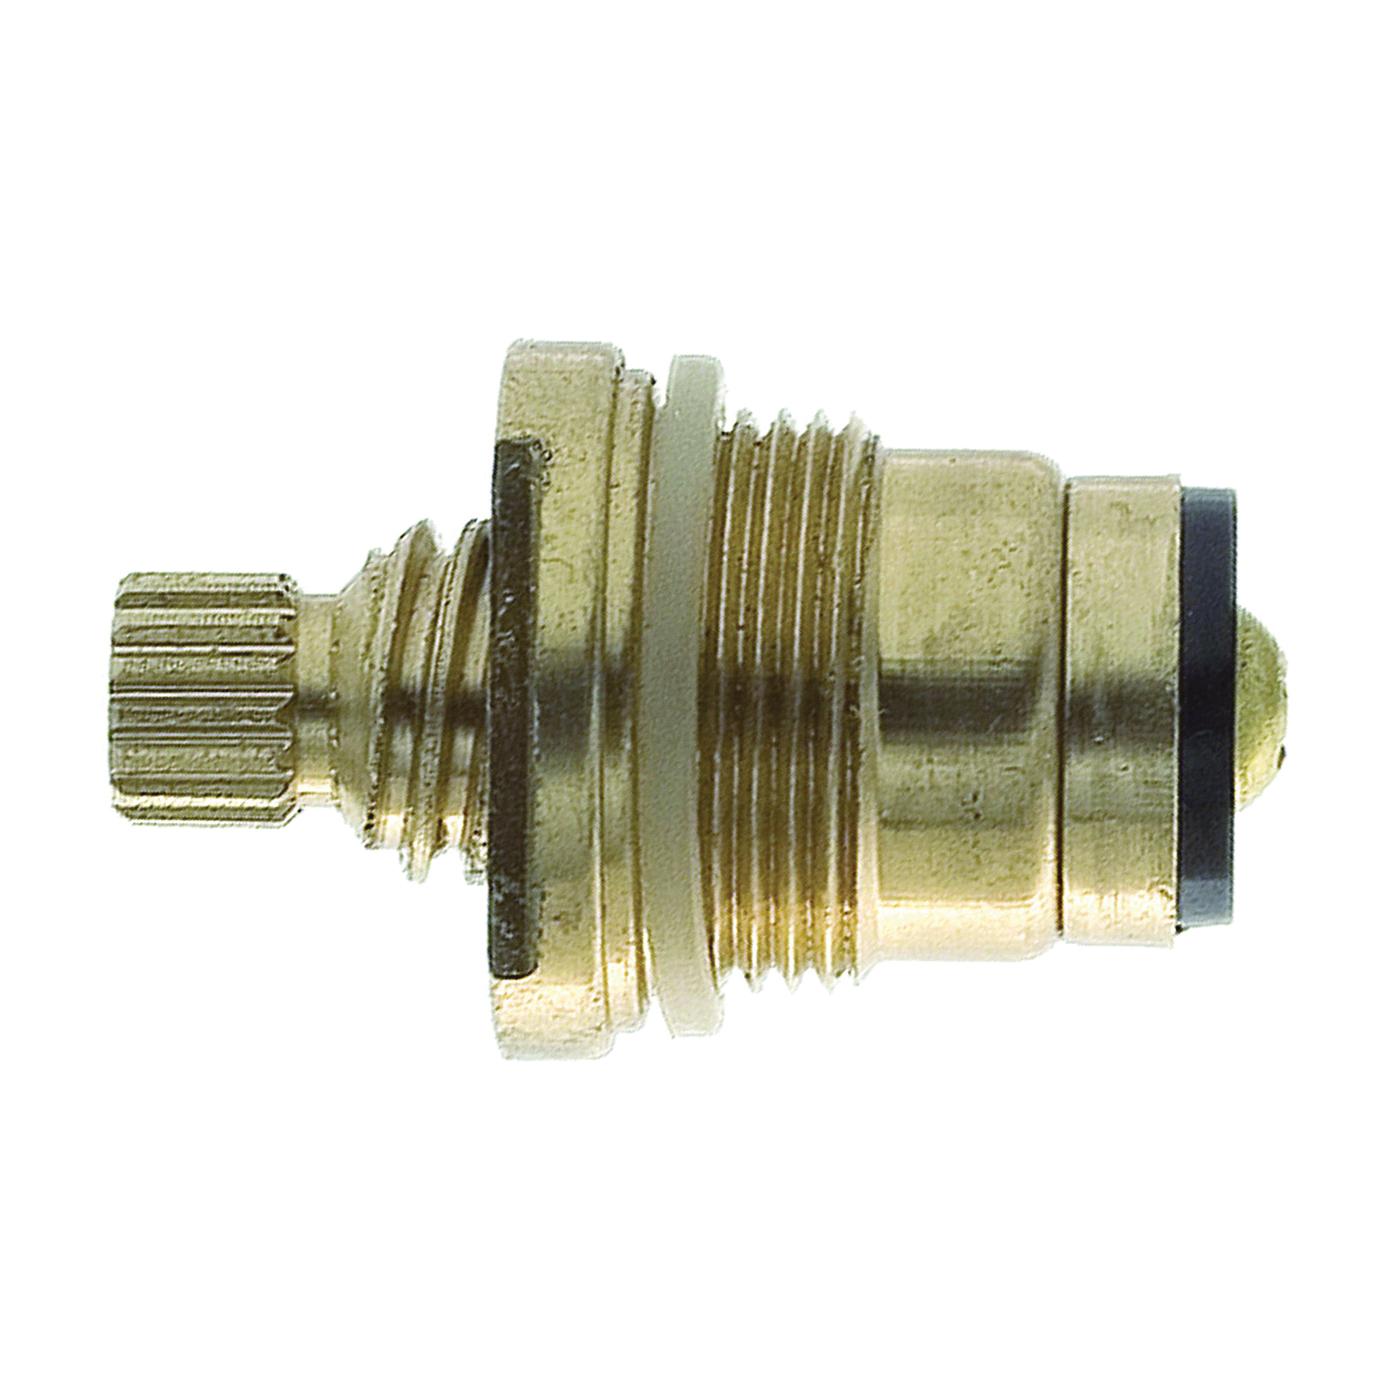 Picture of Danco 15340E Faucet Stem, Brass, Brass, 1-39/64 in L